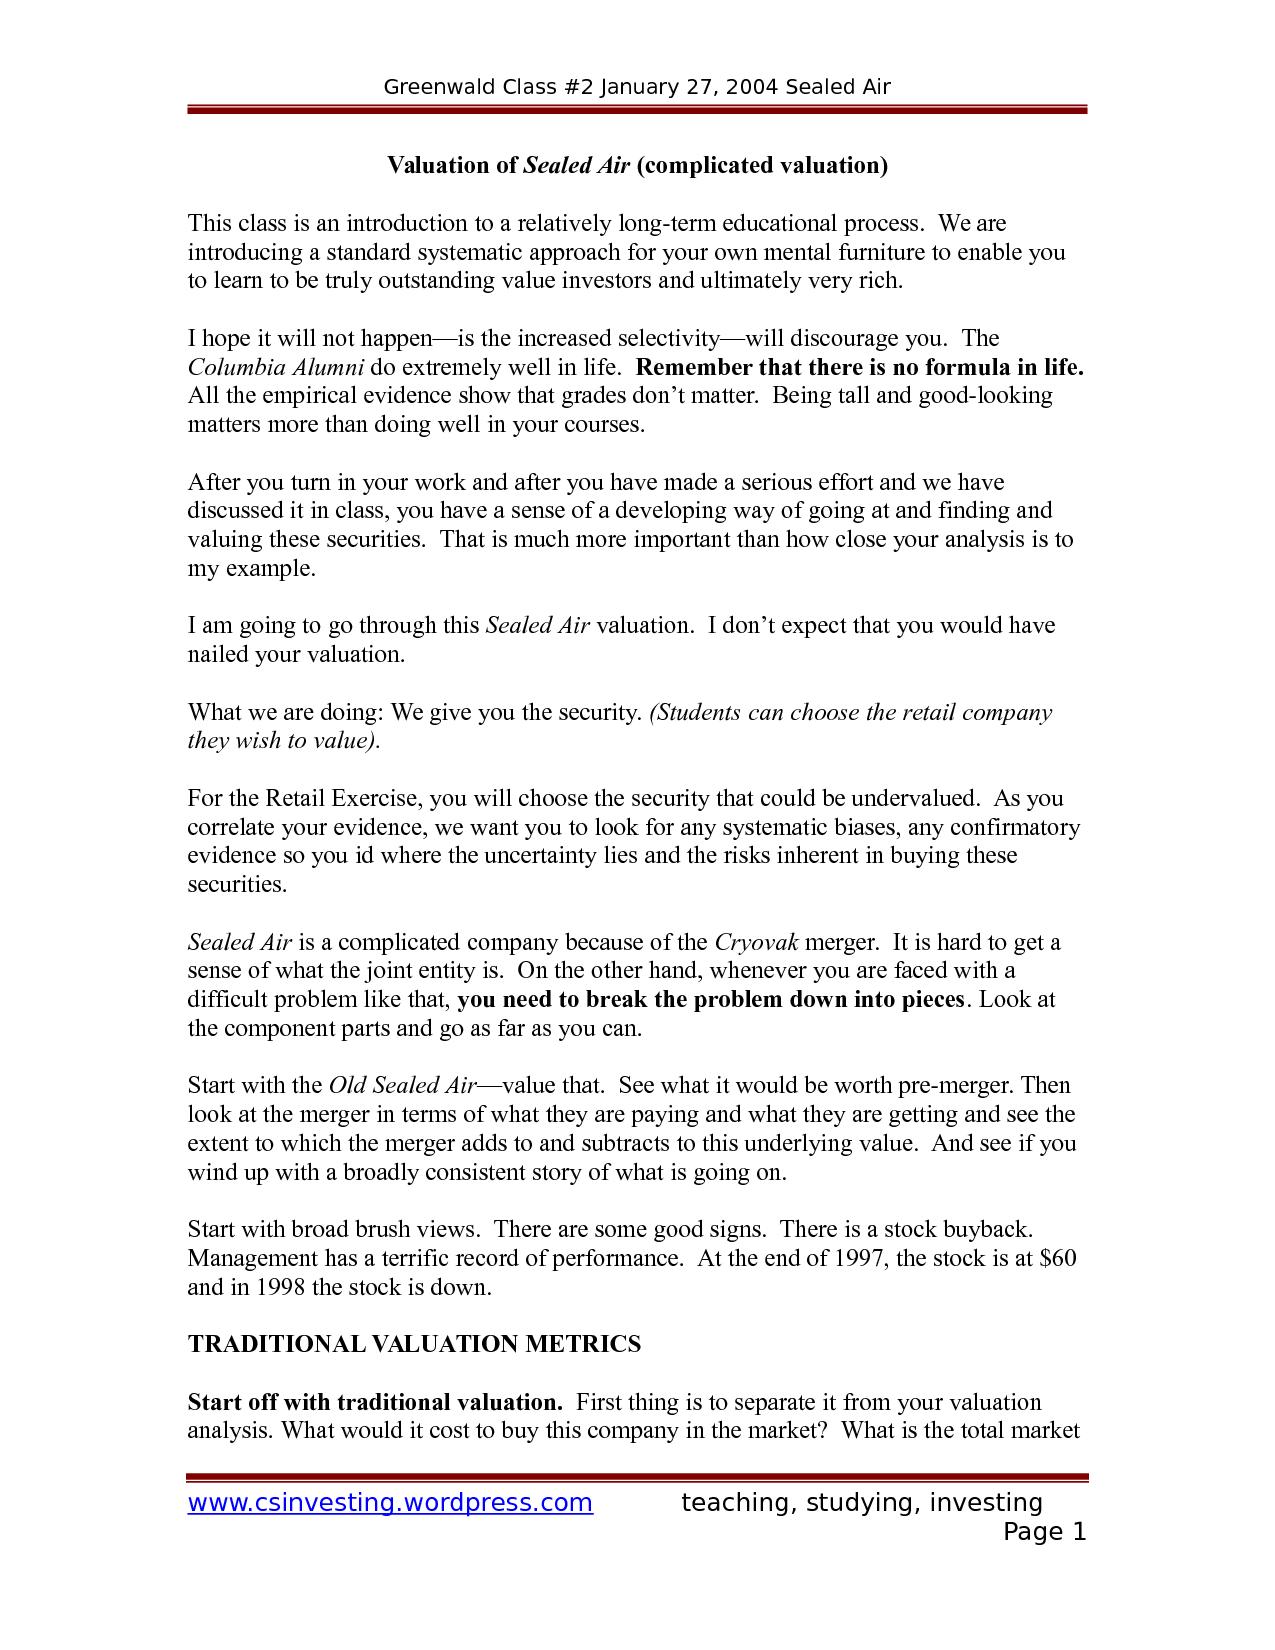 sealed air case essay example